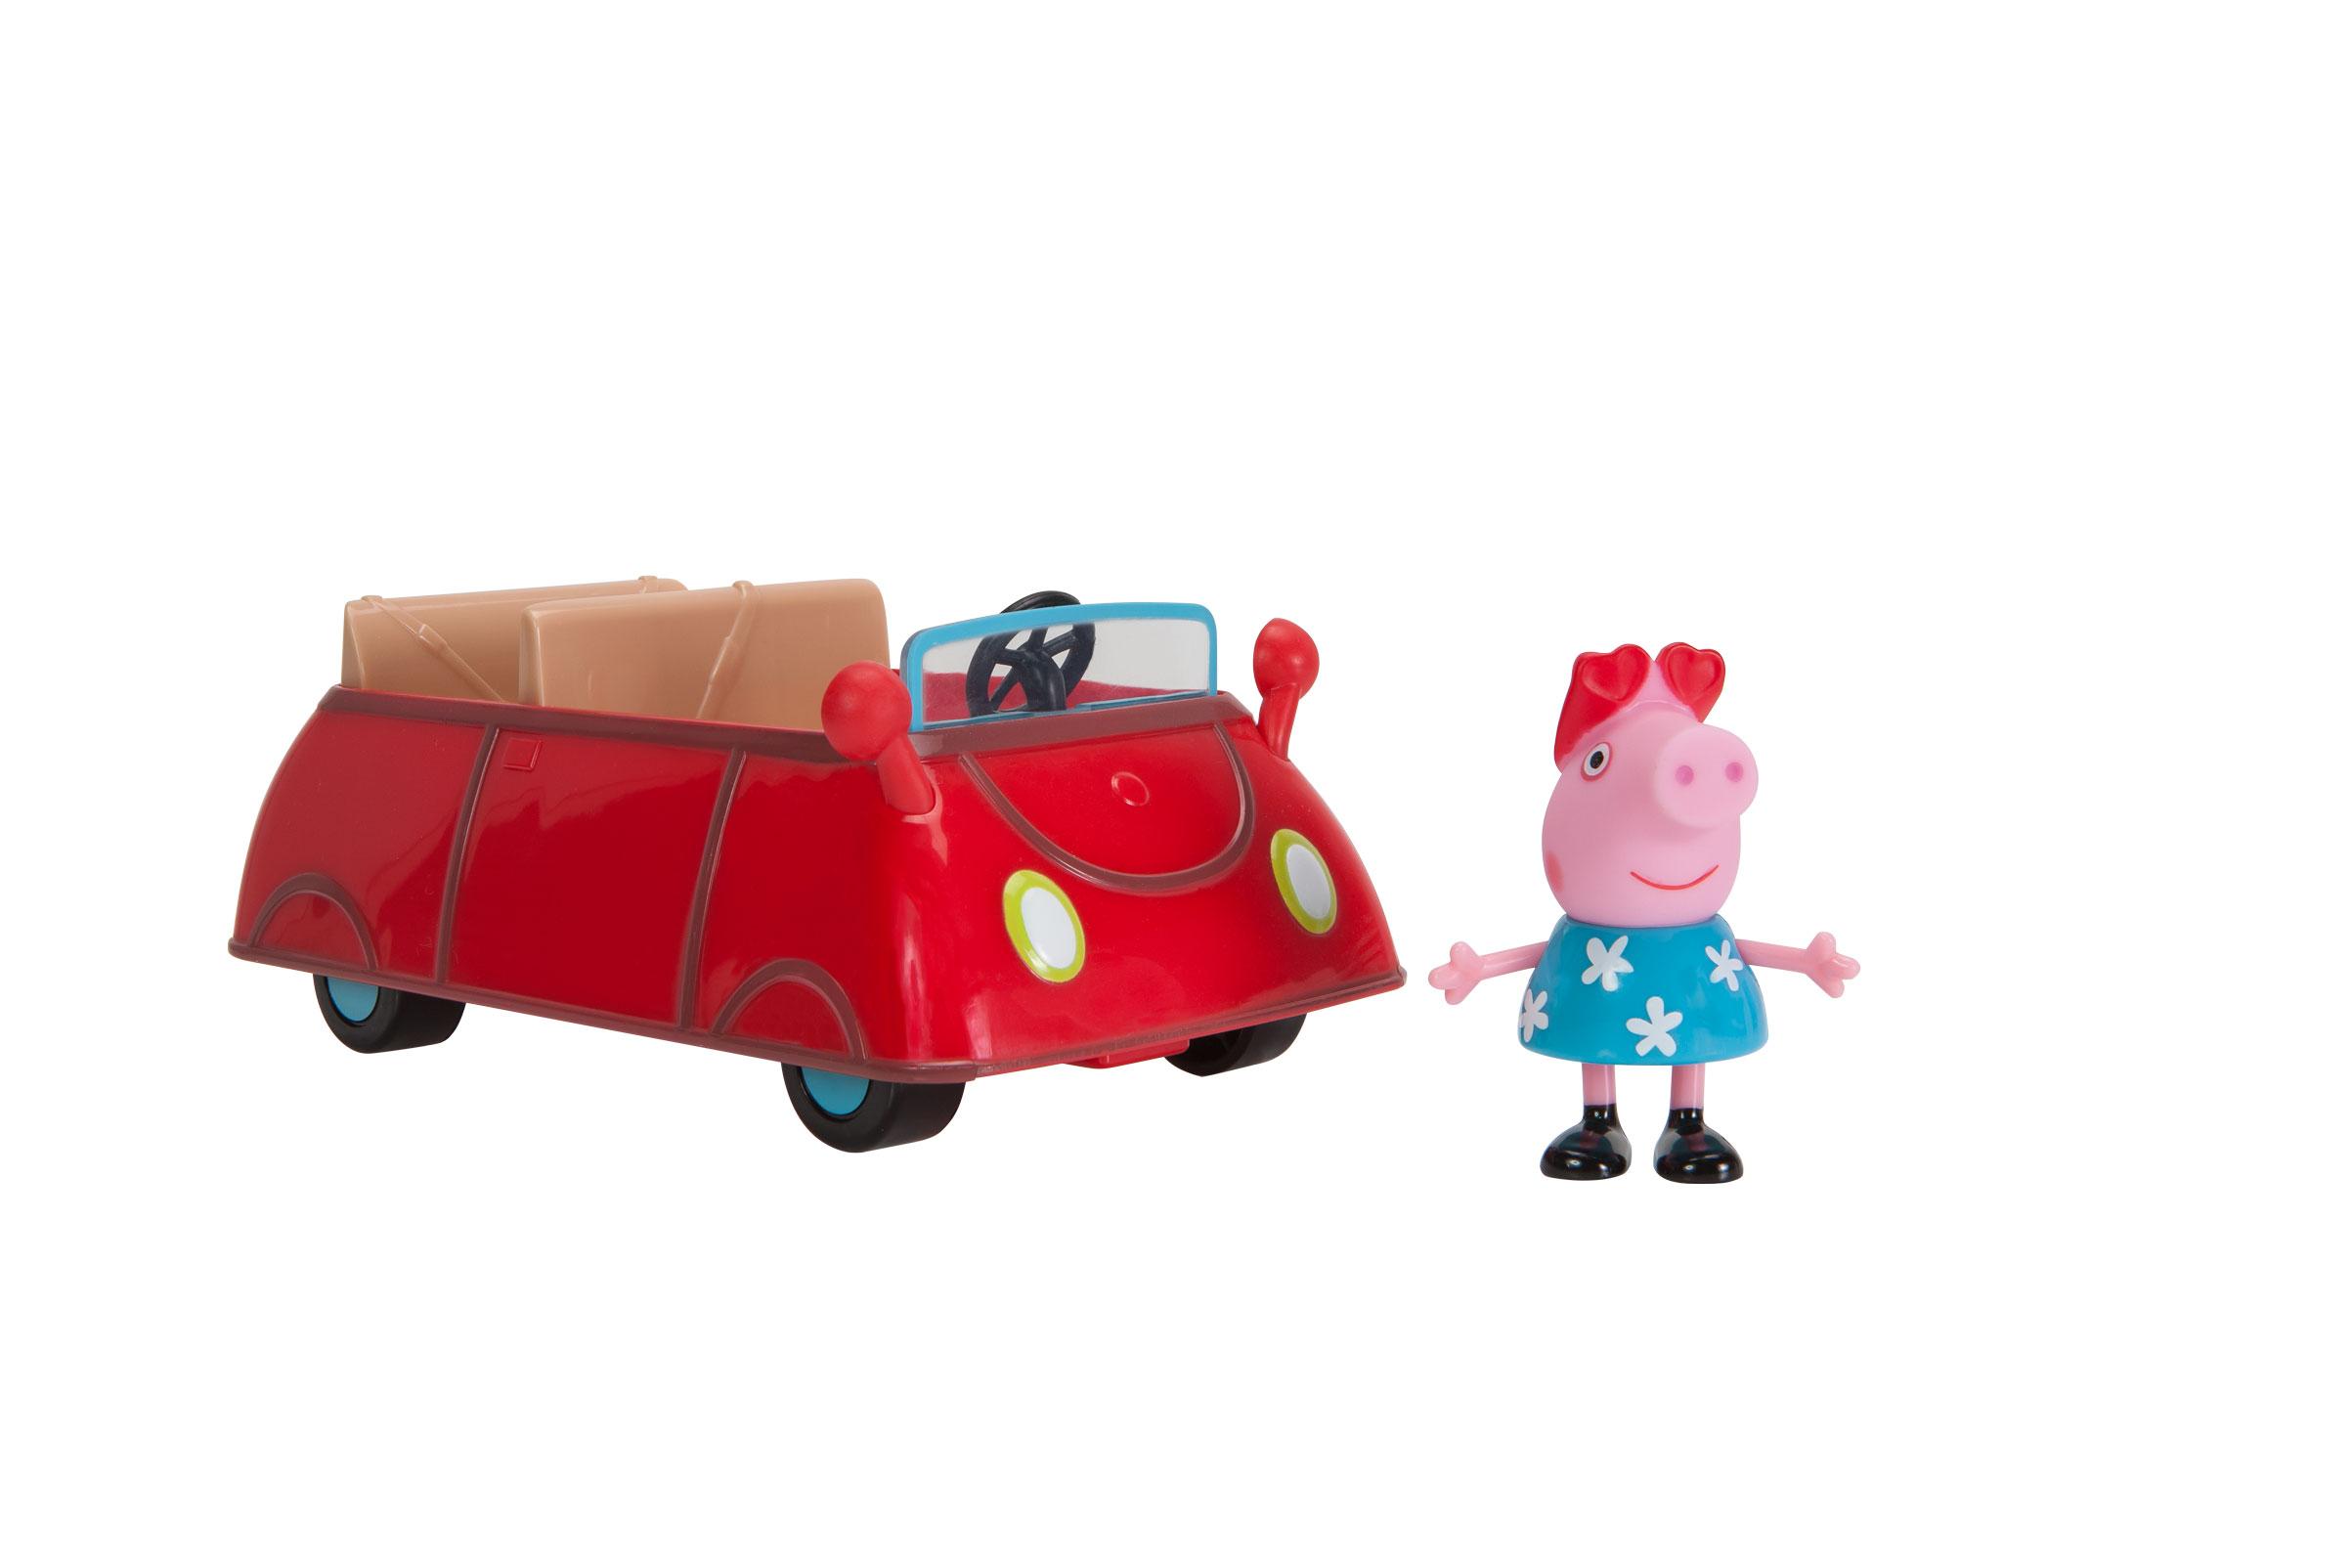 Peppa's kleines rotes Auto